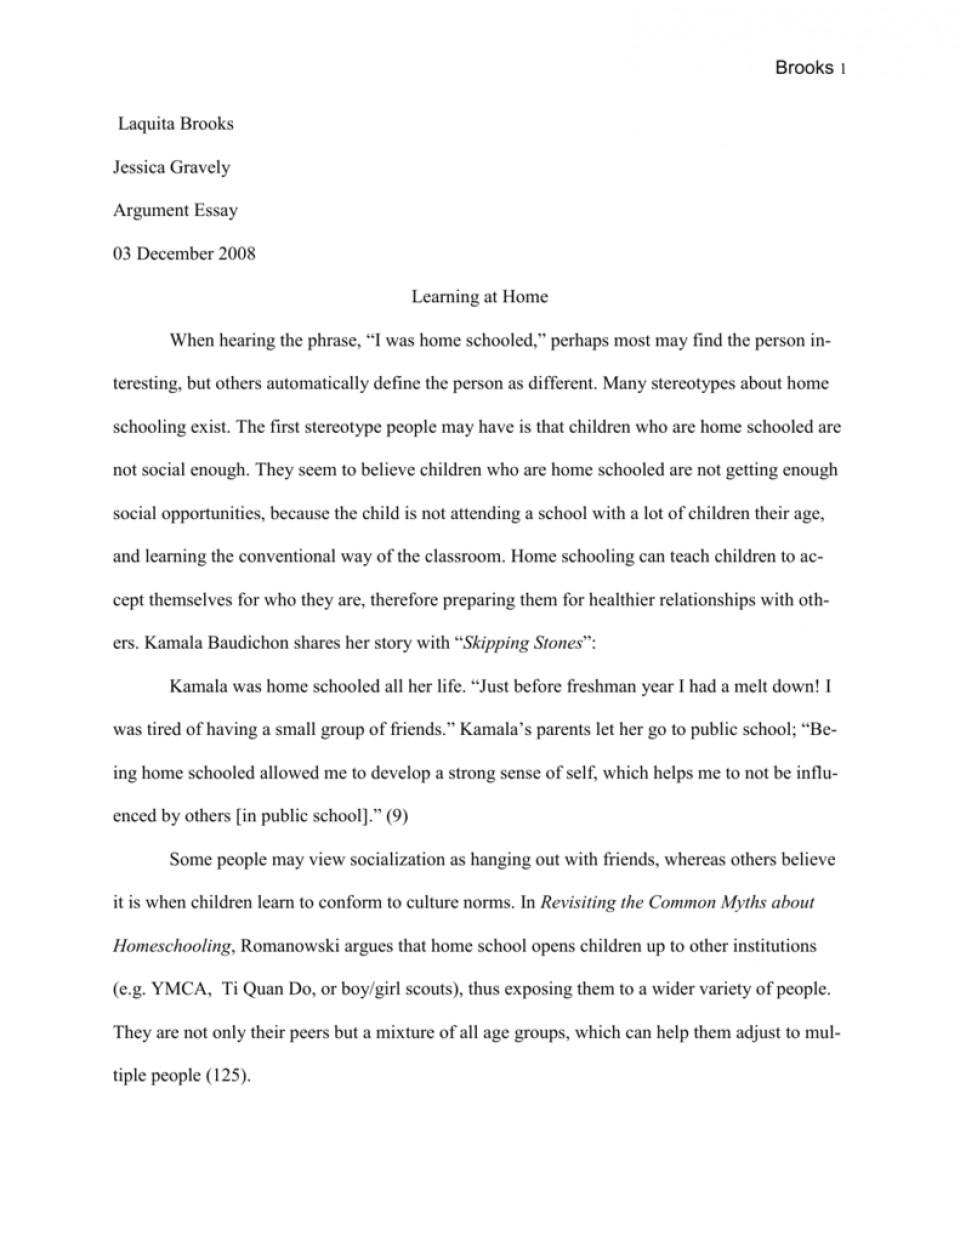 Best term paper ghostwriting service online